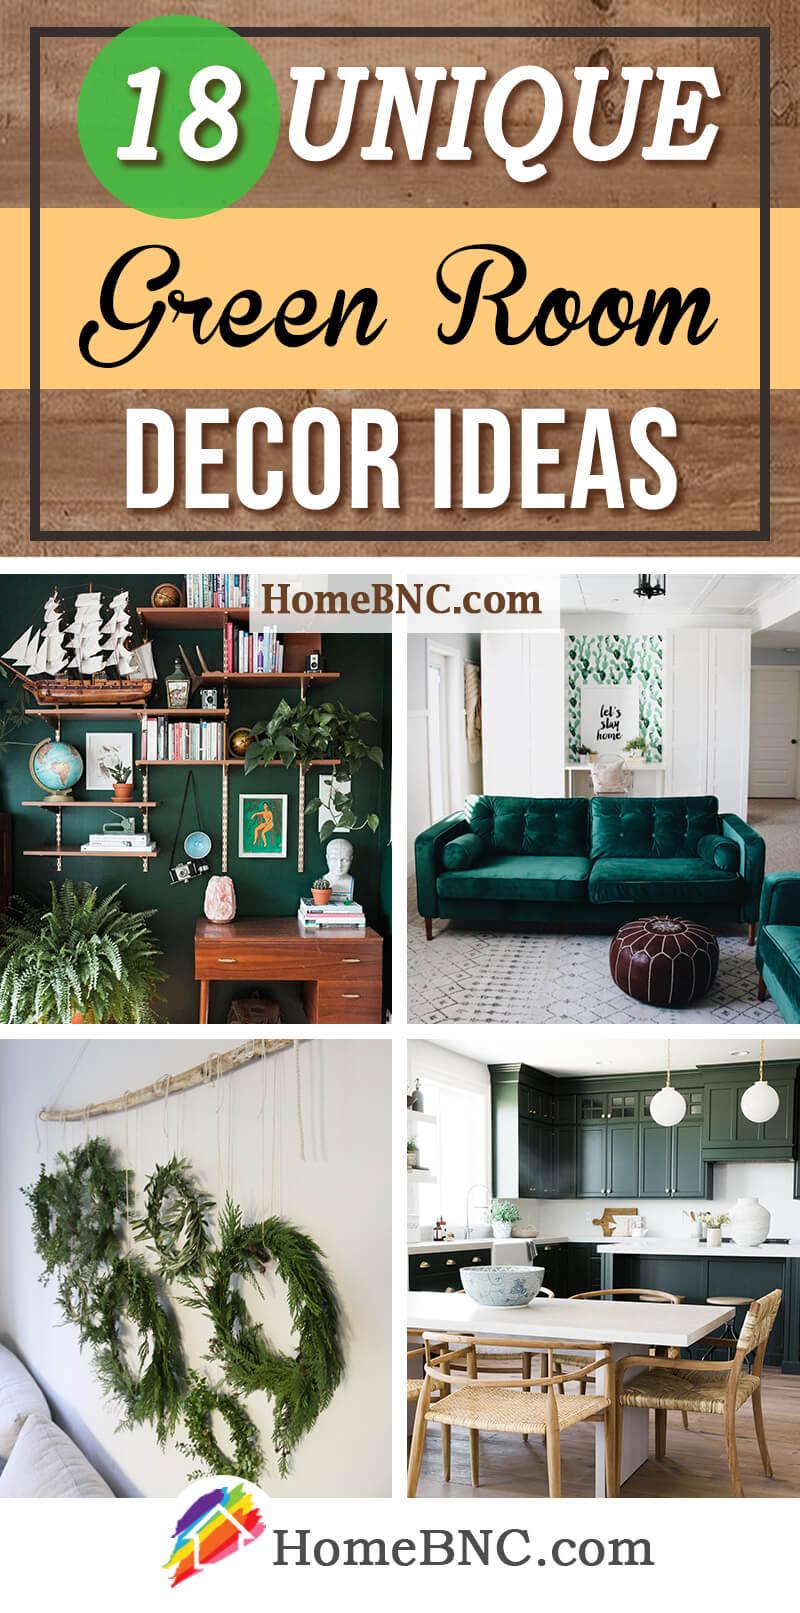 Green Room Decor Ideas